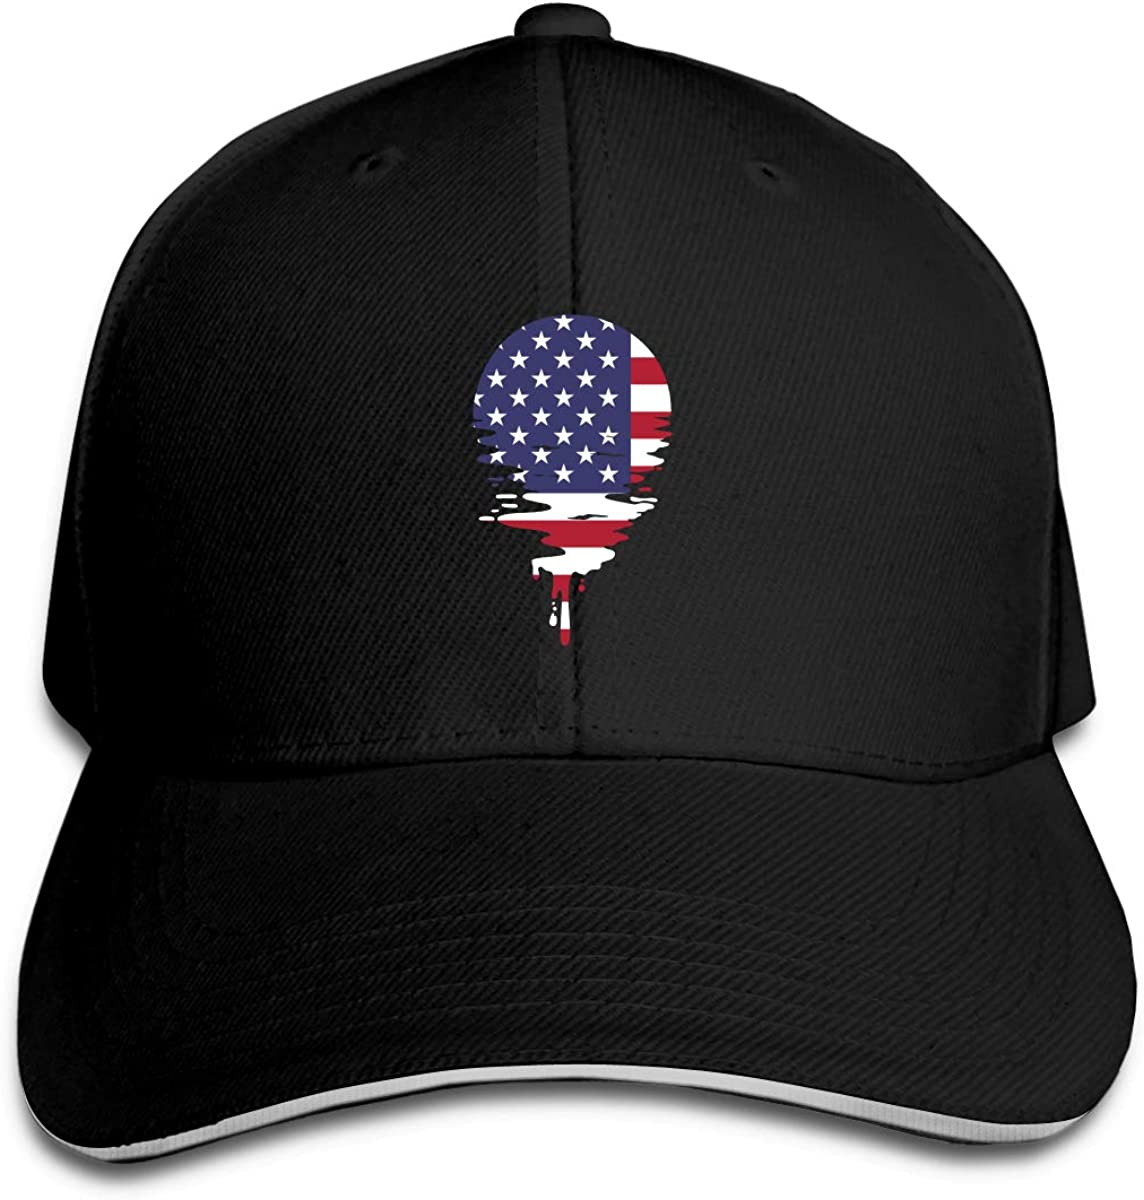 Sunset American Flag Outdoor Snapback Sandwich Cap Adjustable Baseball Hat Plain Cap